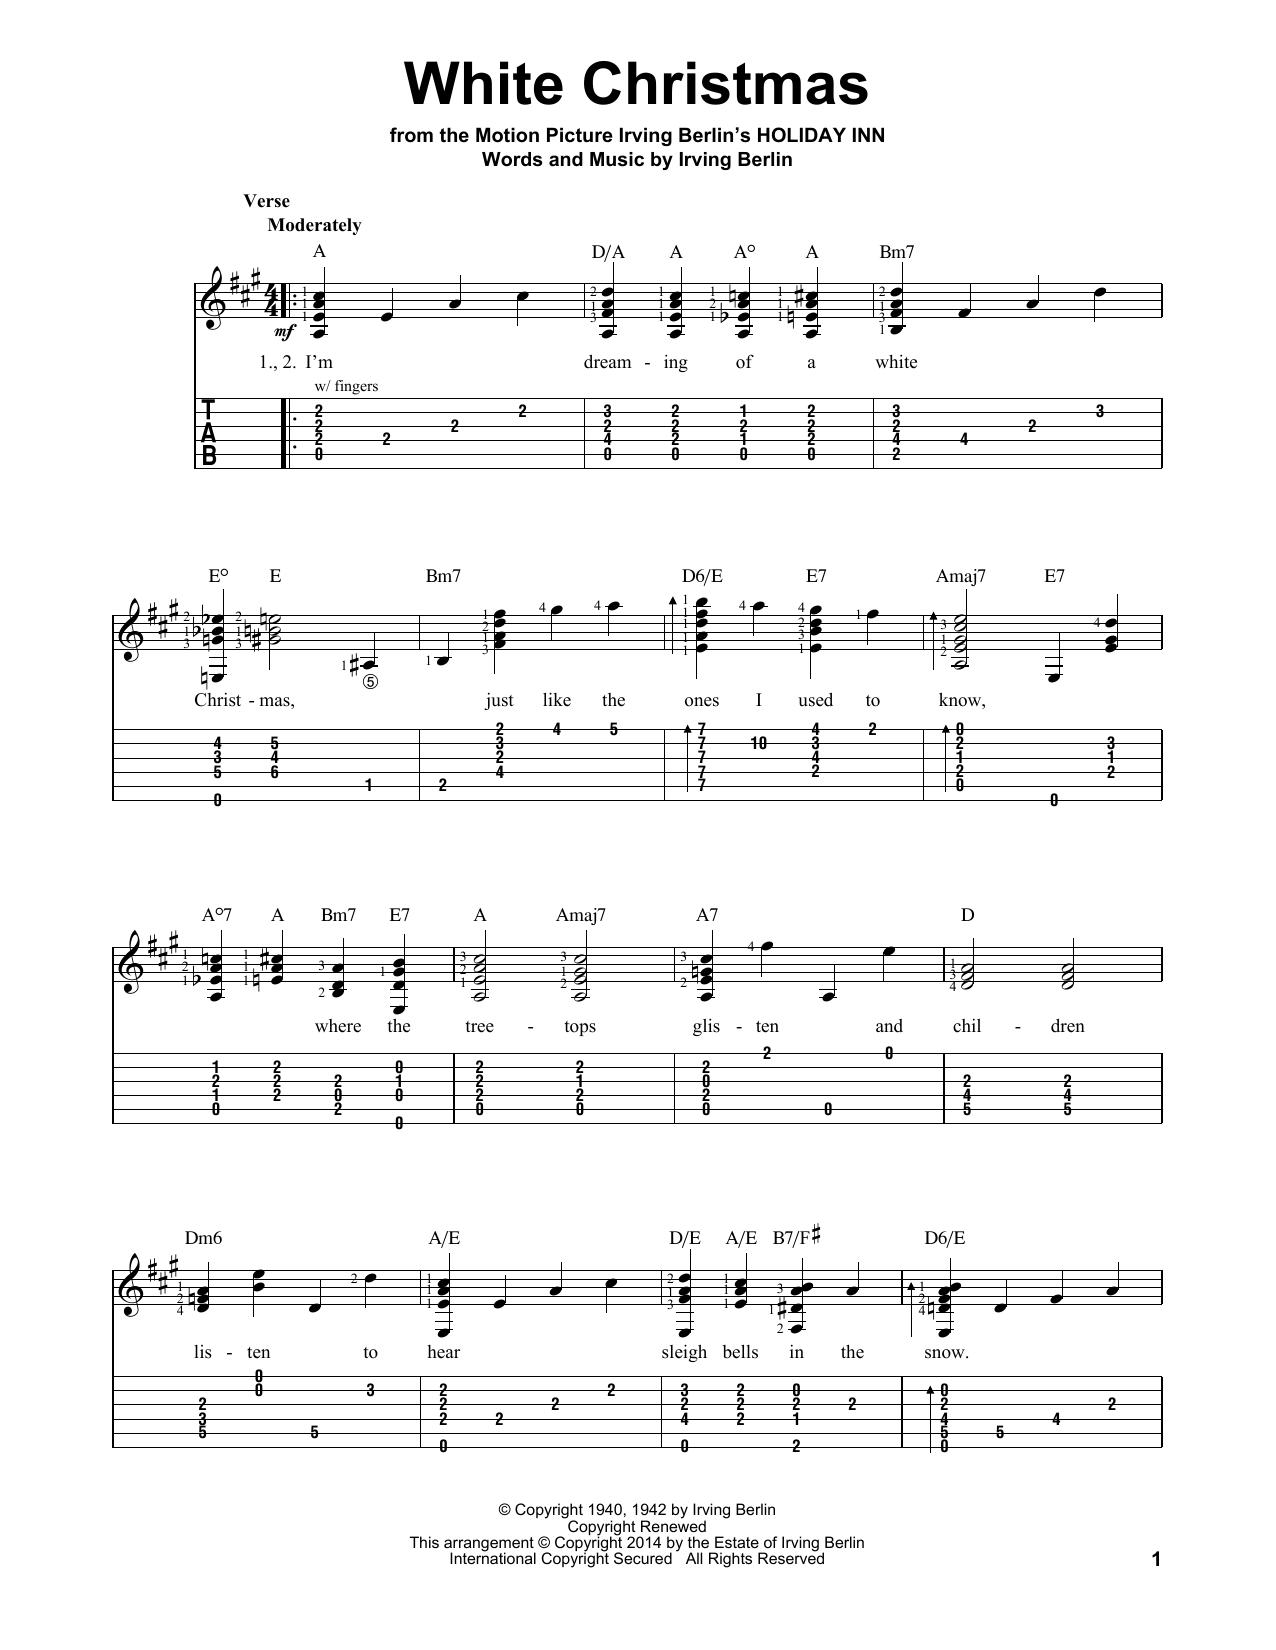 Sheet Music Digital Files To Print Licensed Rascal Flatts Digital